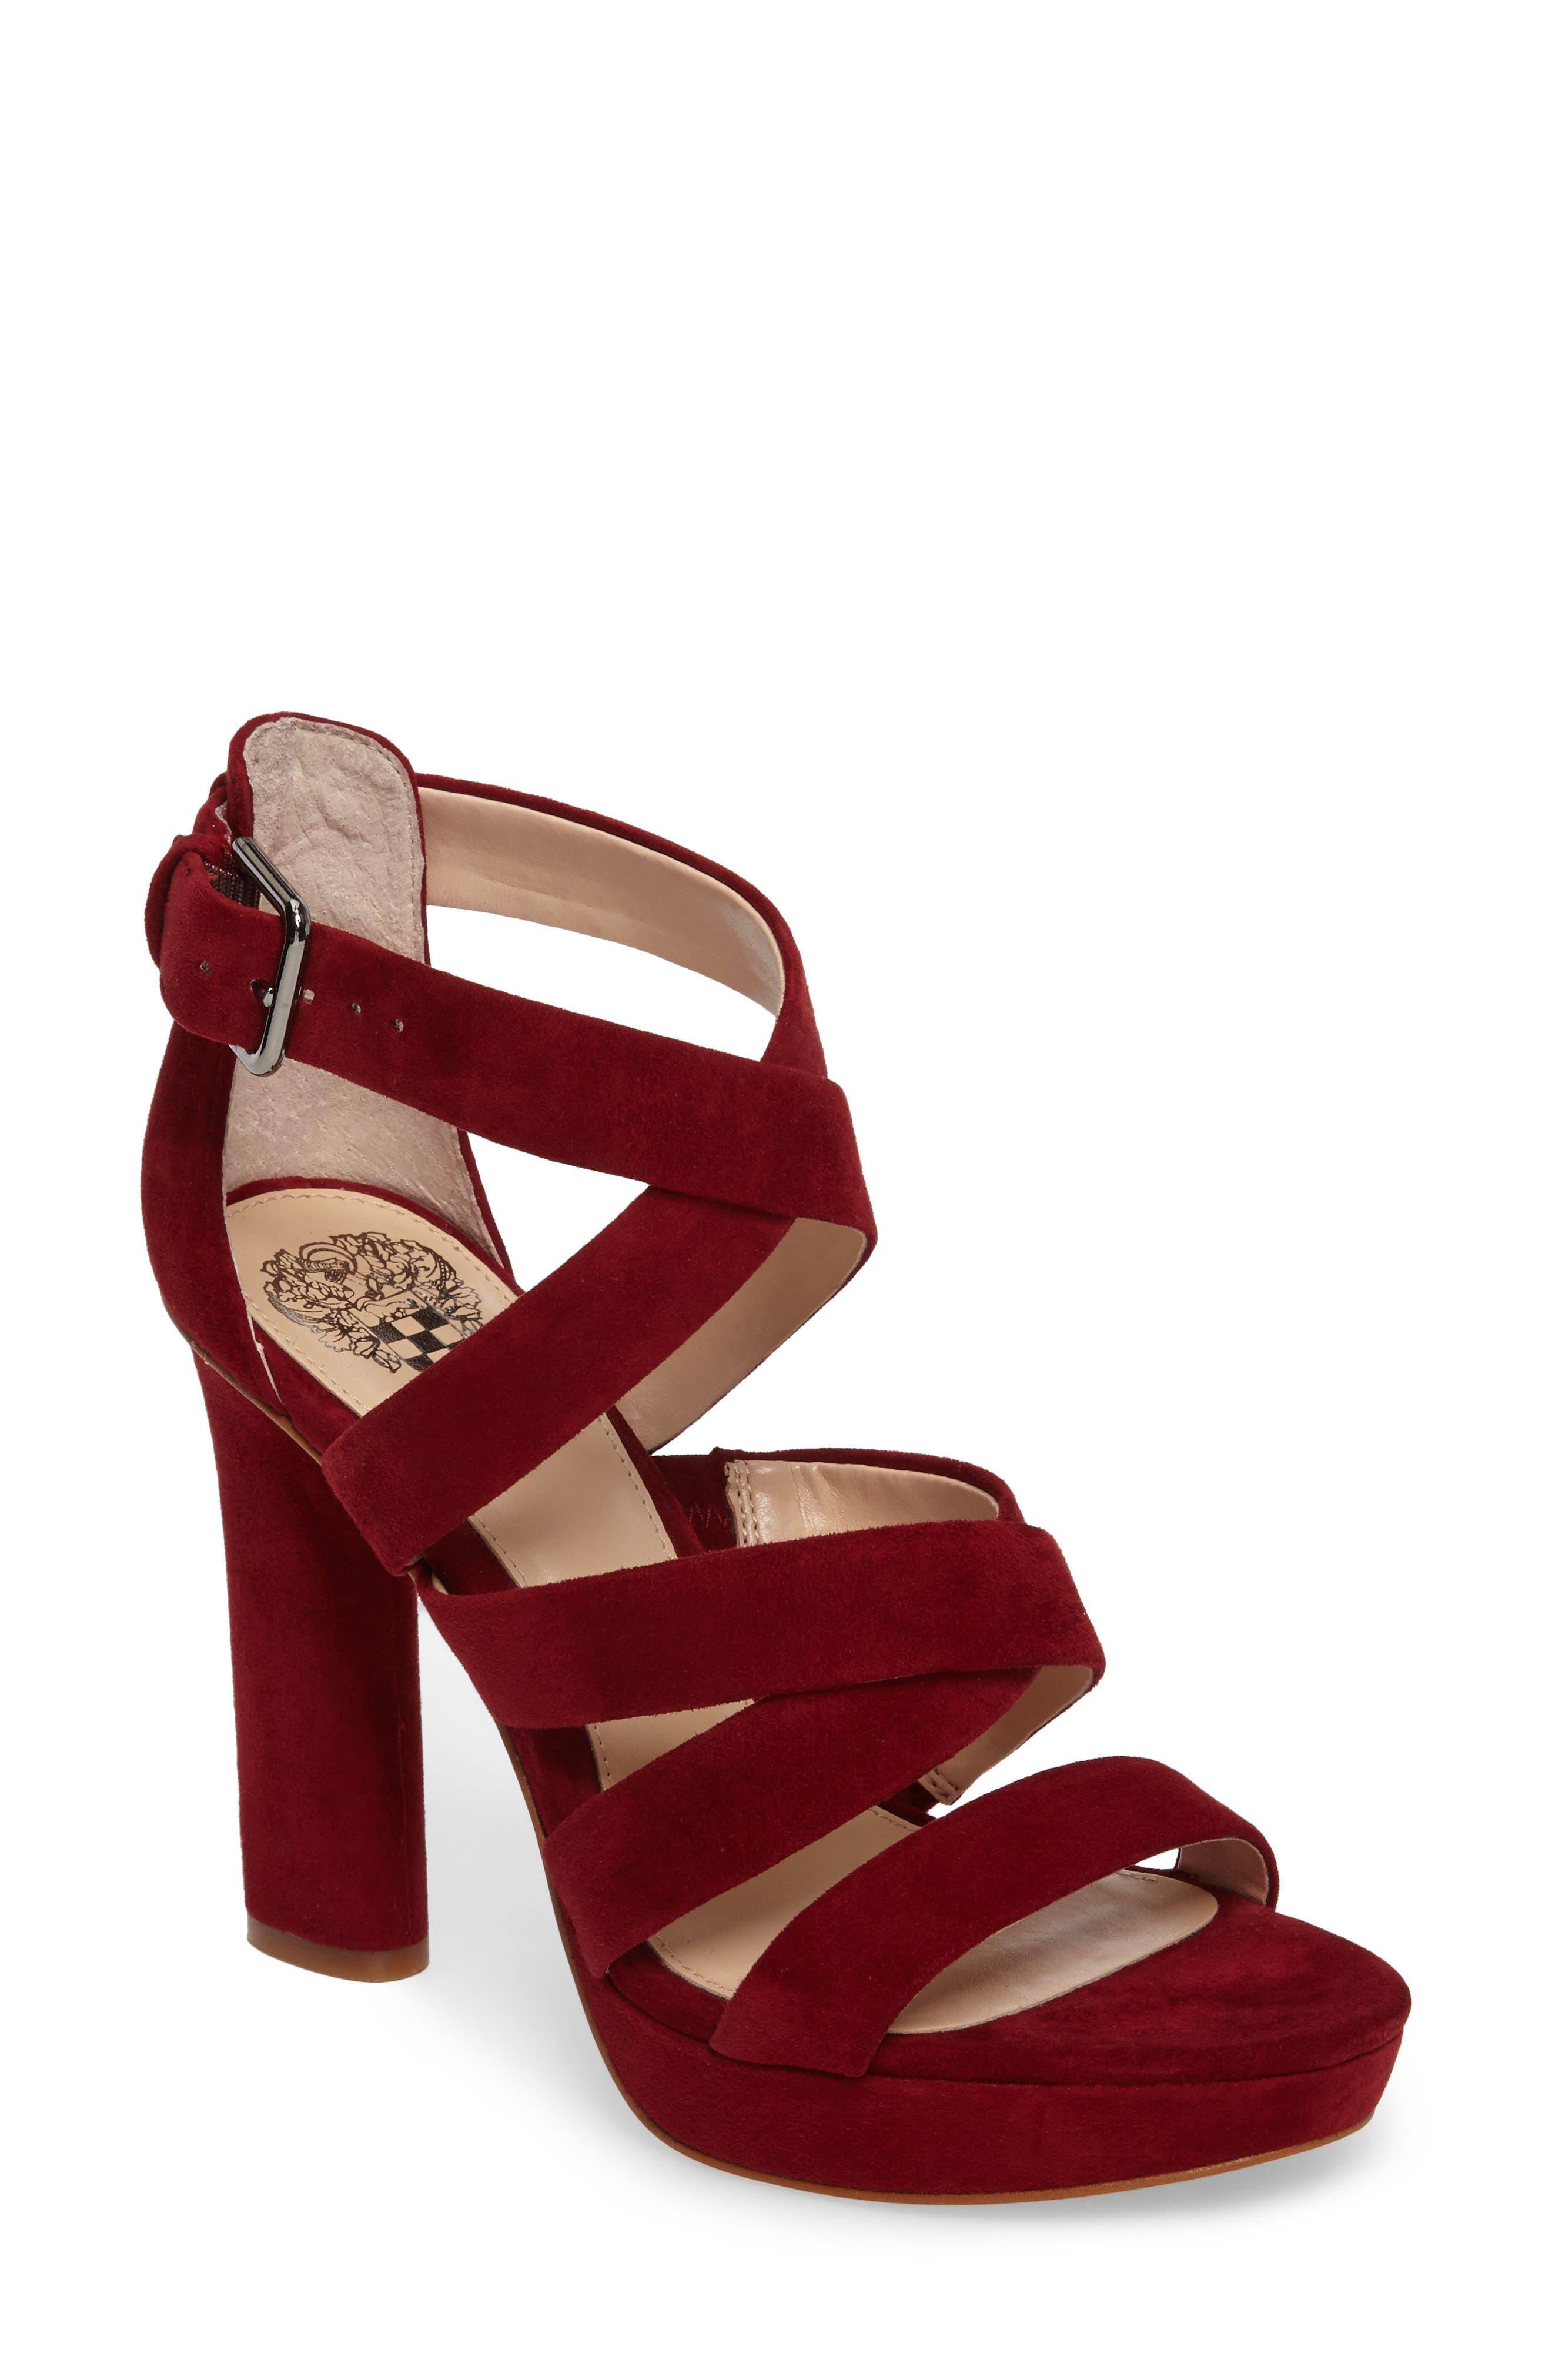 VINCE CAMUTO Catyna Platform Sandal